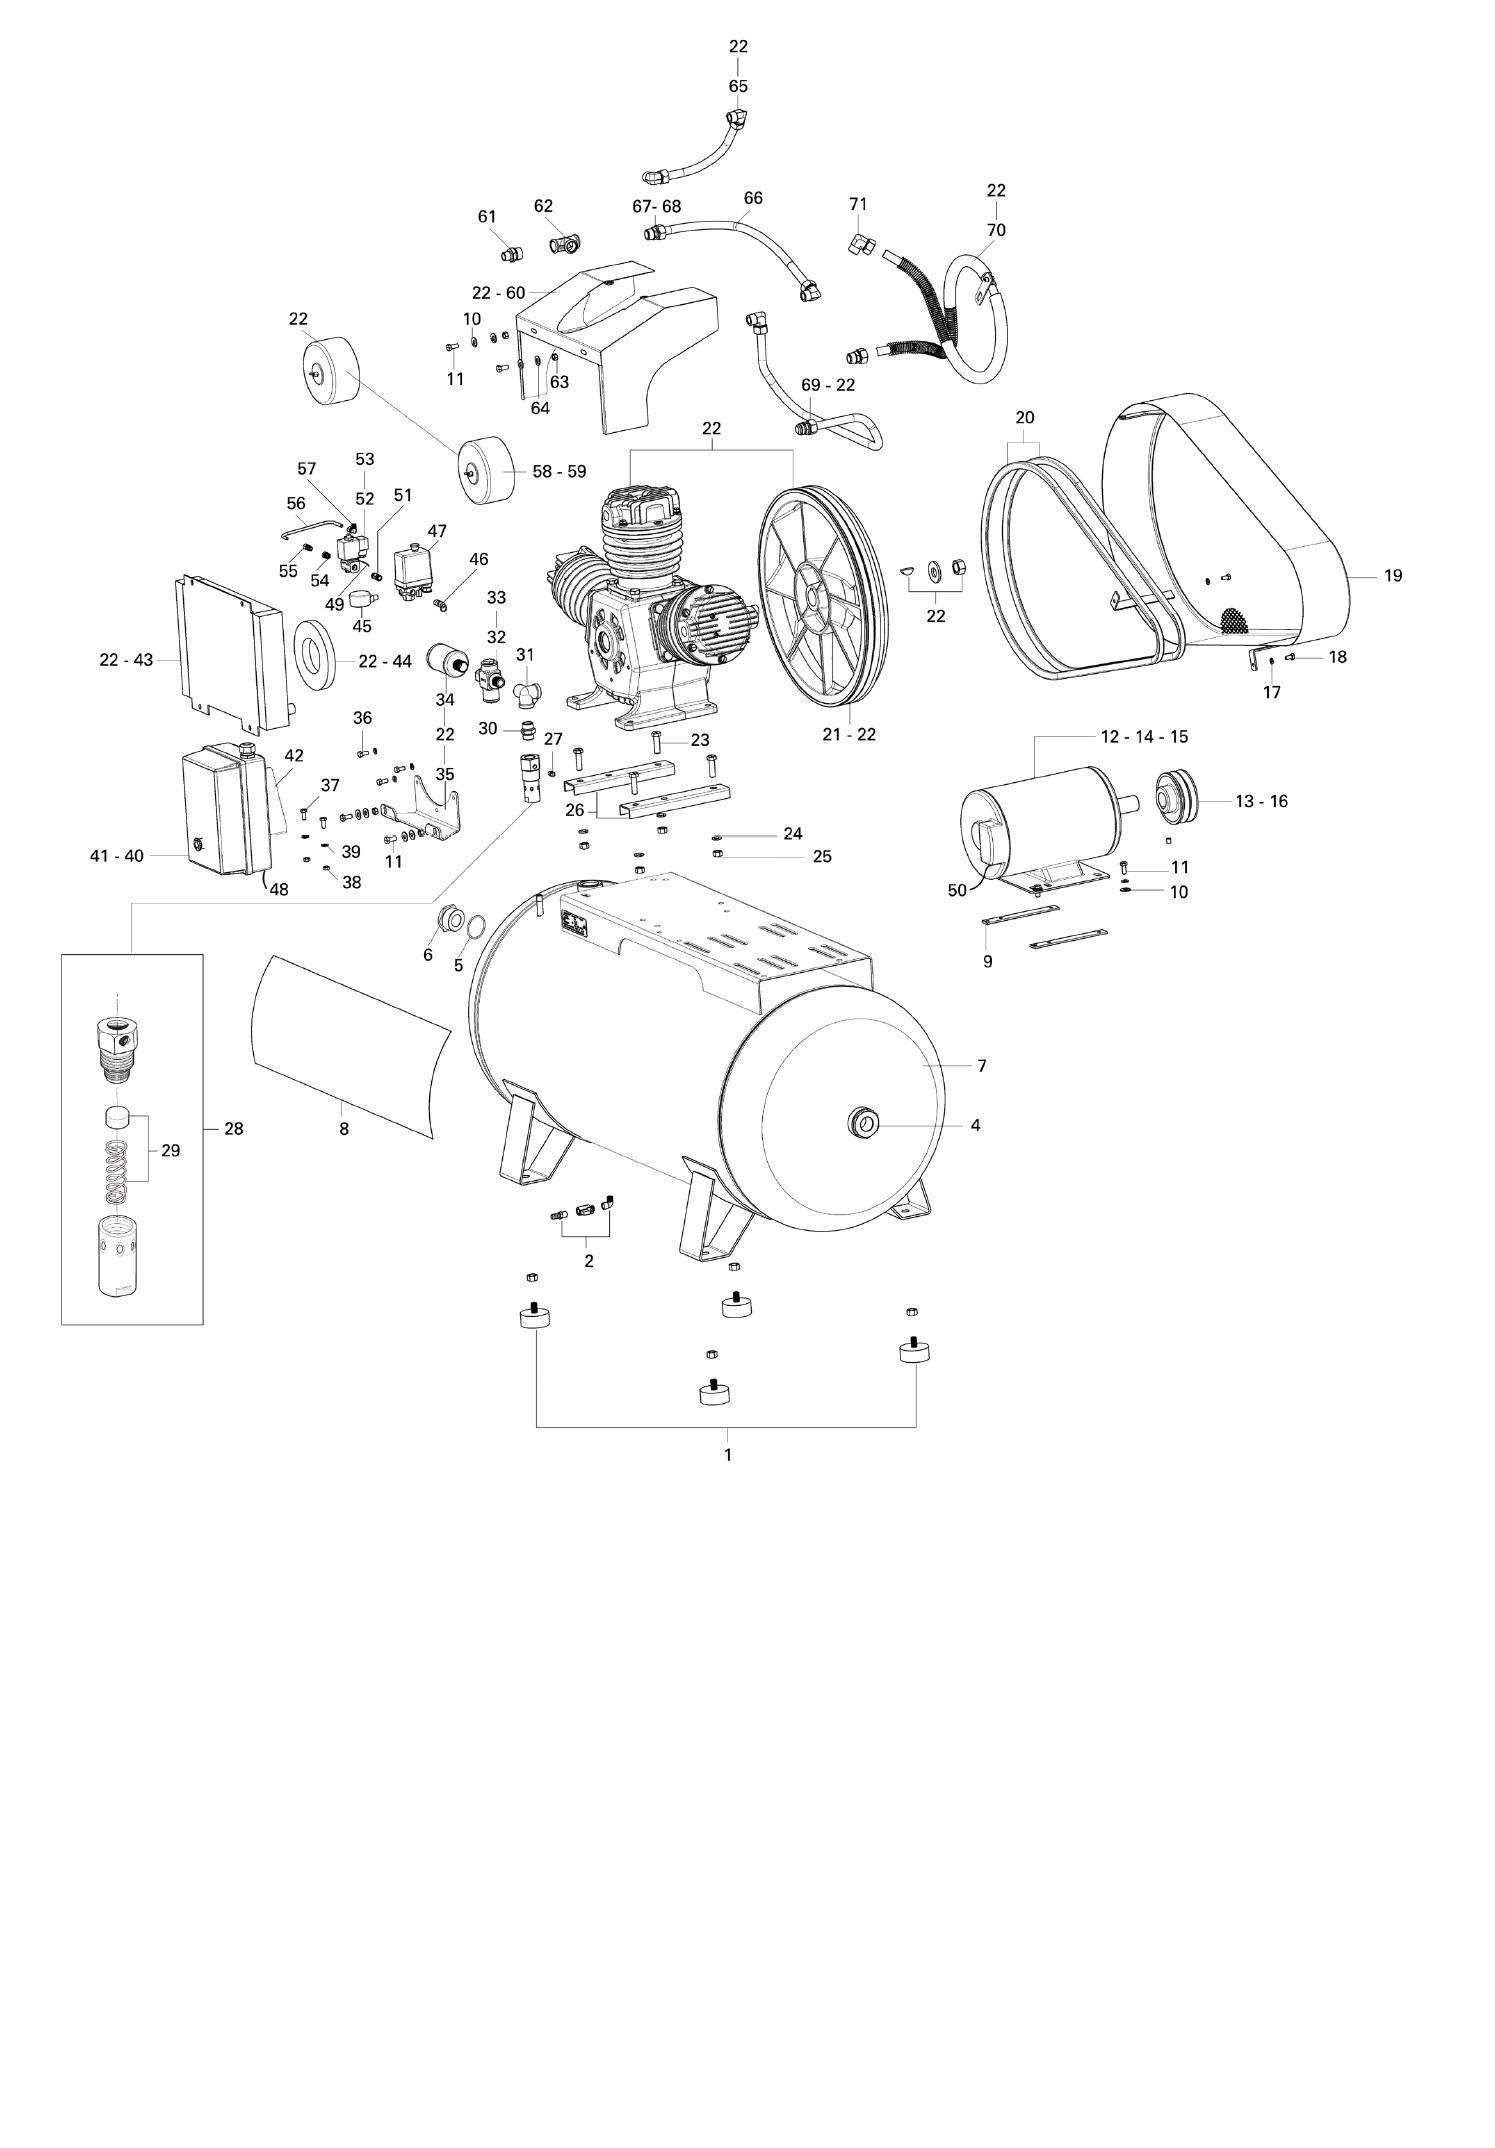 Schulz Oilless Air Compressor Csw 60 420 15 Hp 60 Cfm